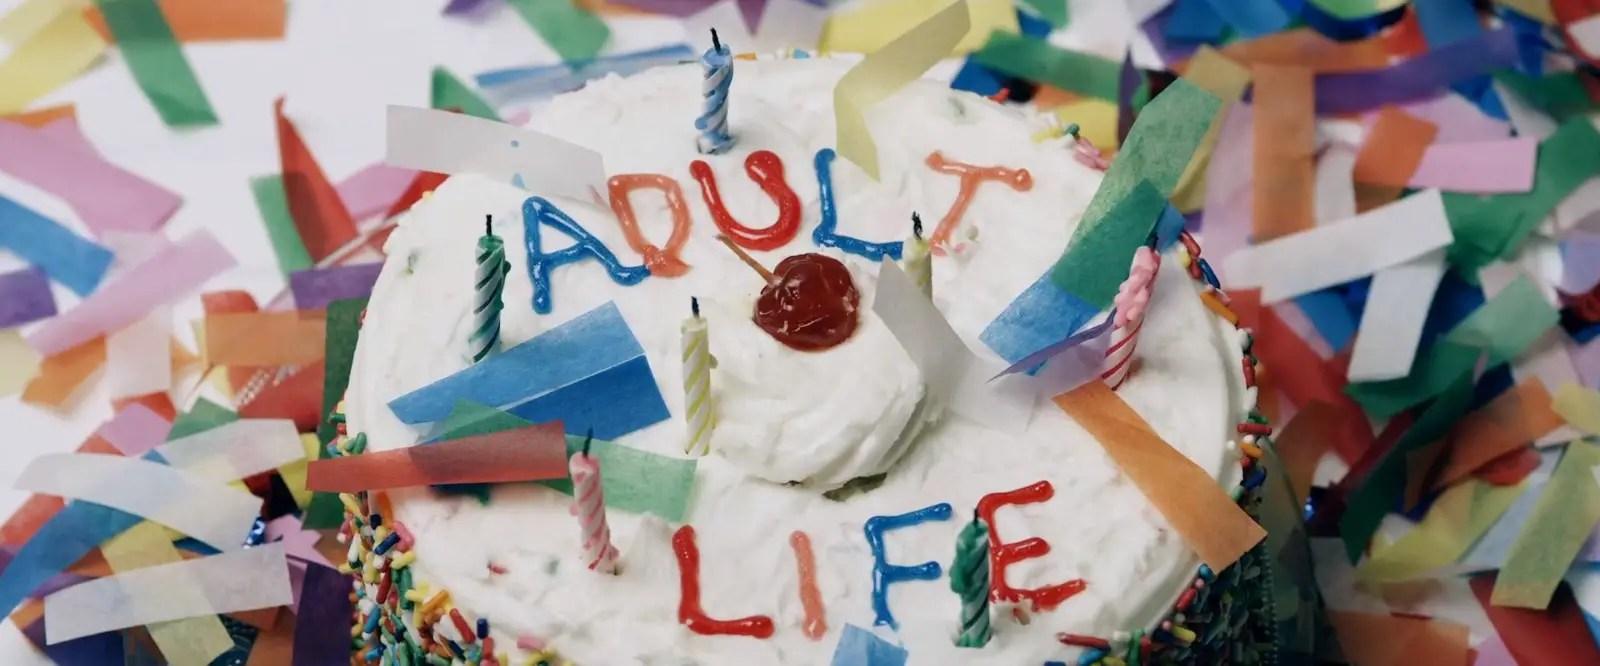 Adult Life - Miles Francis